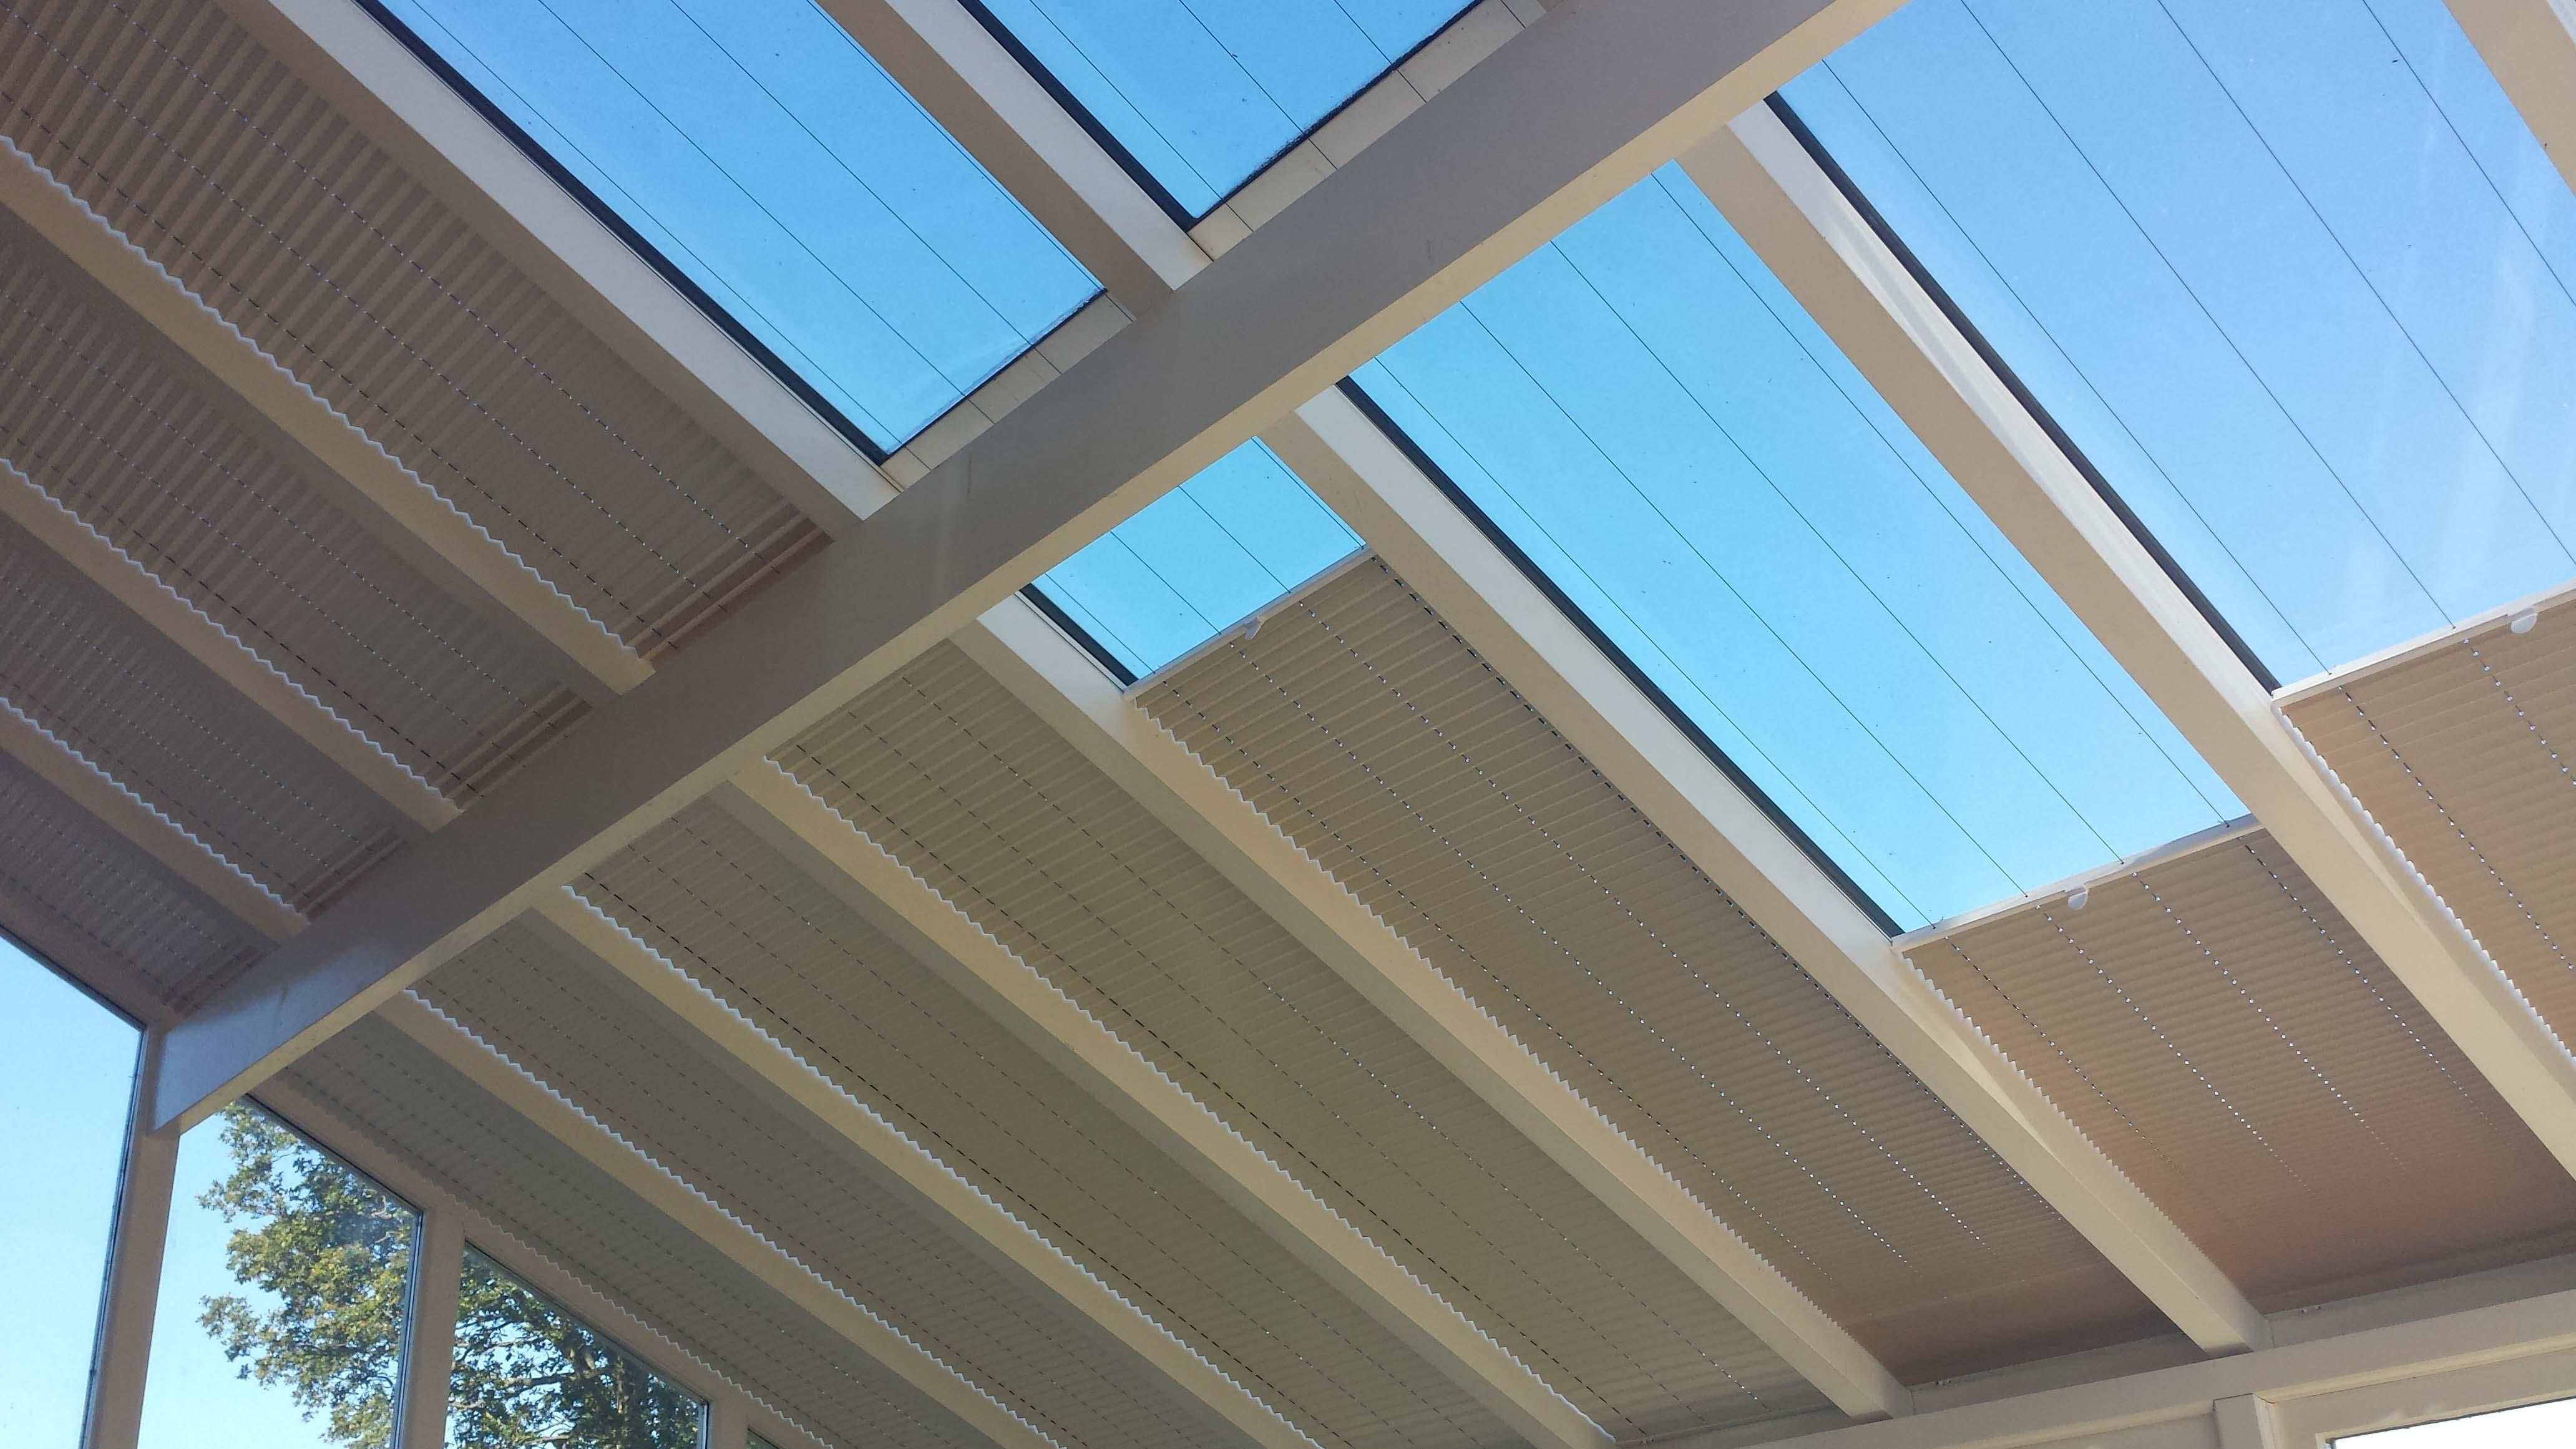 conservatory roof blinds diy conservatory roof blind ideas diy conservatory roof blind ideas  beautiful NJEKVLM